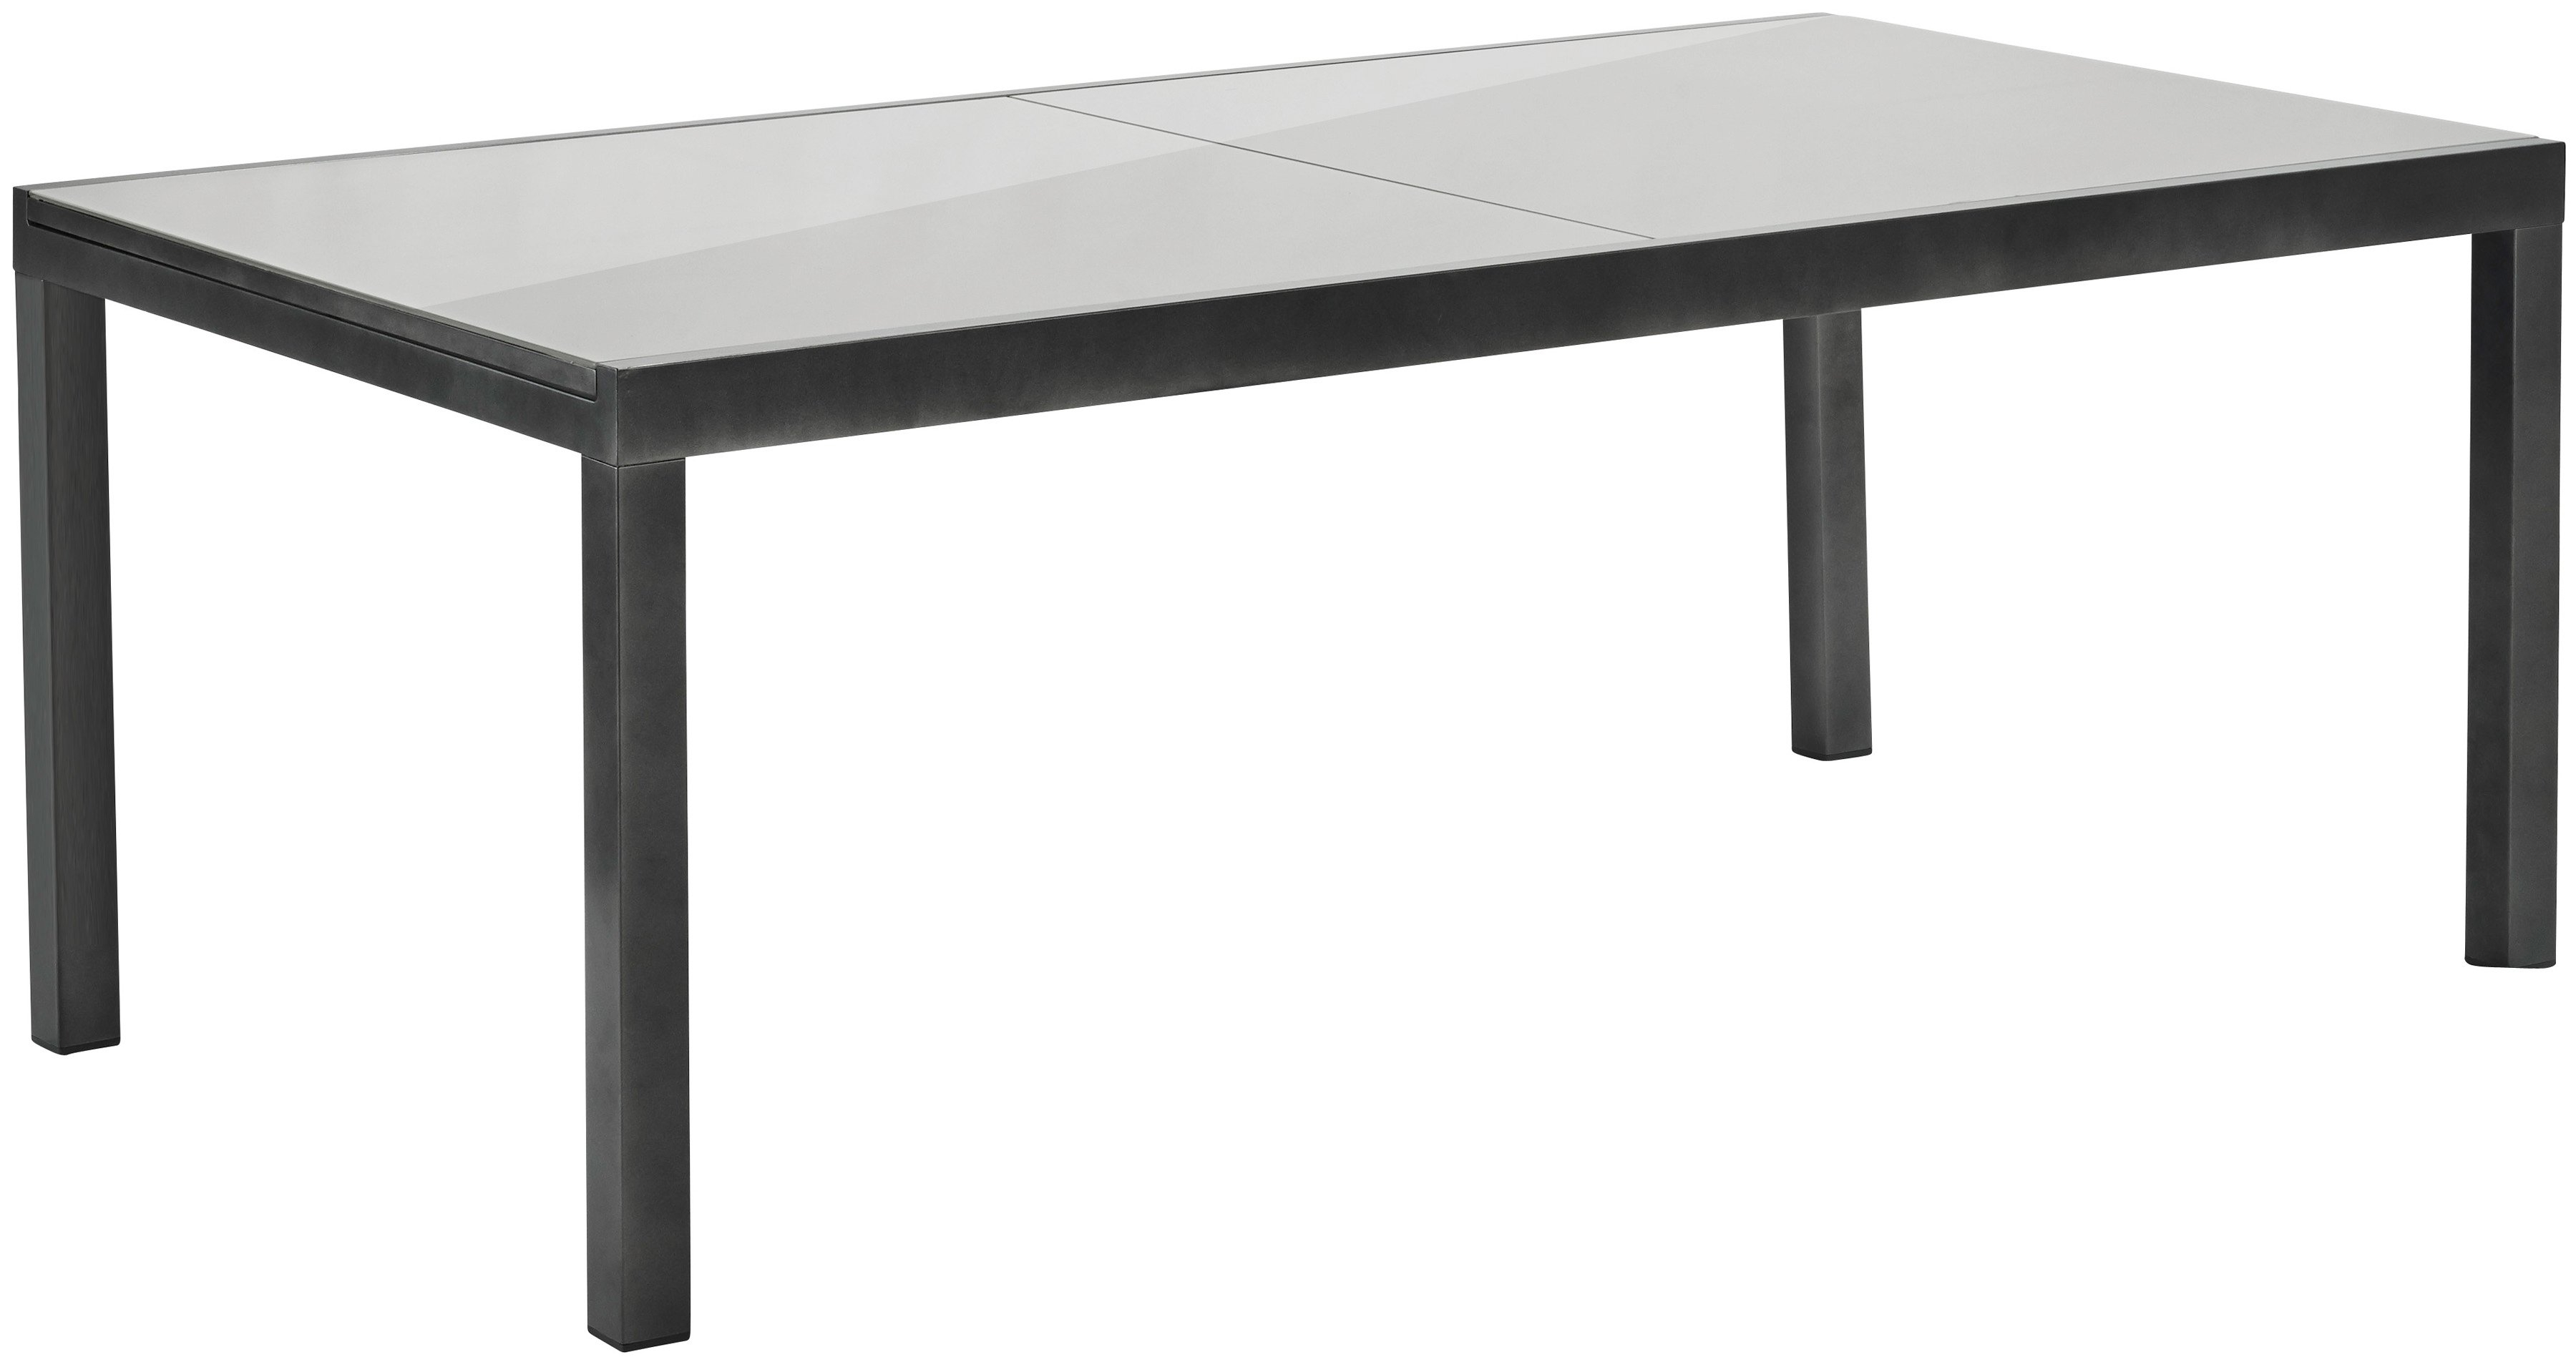 merxx uittrektafel 110x300 cm aluminium glas grijs snel online gekocht otto. Black Bedroom Furniture Sets. Home Design Ideas